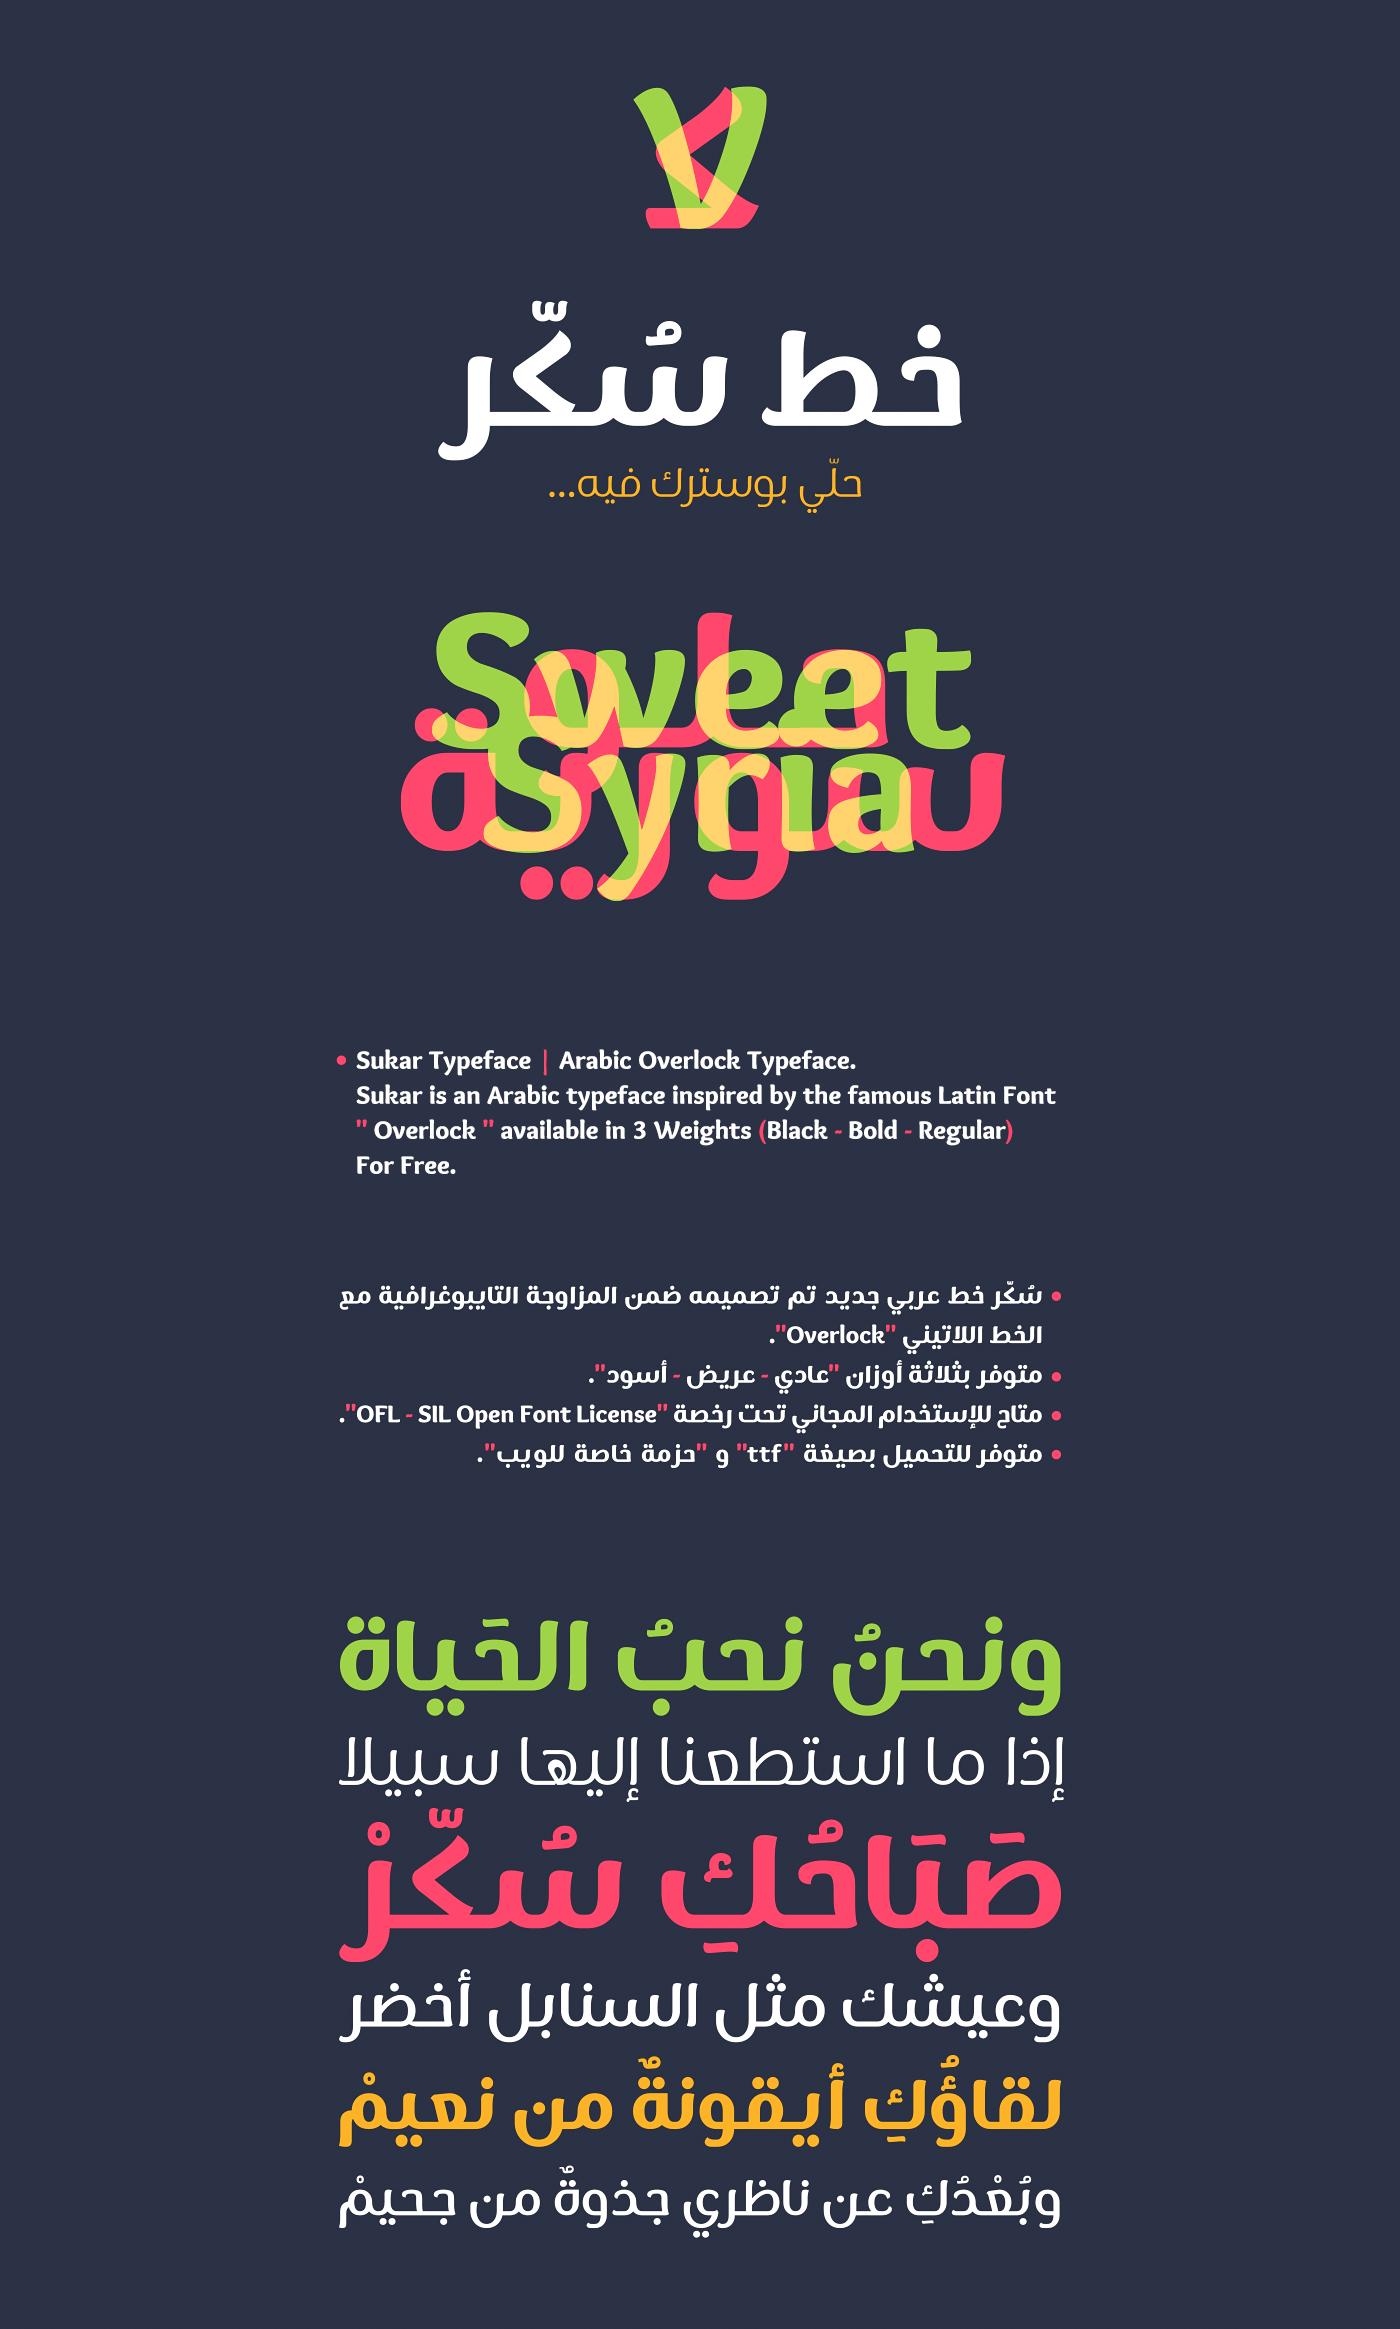 Sukar Typeface | Arabic Overlock Typeface (free) on Behance